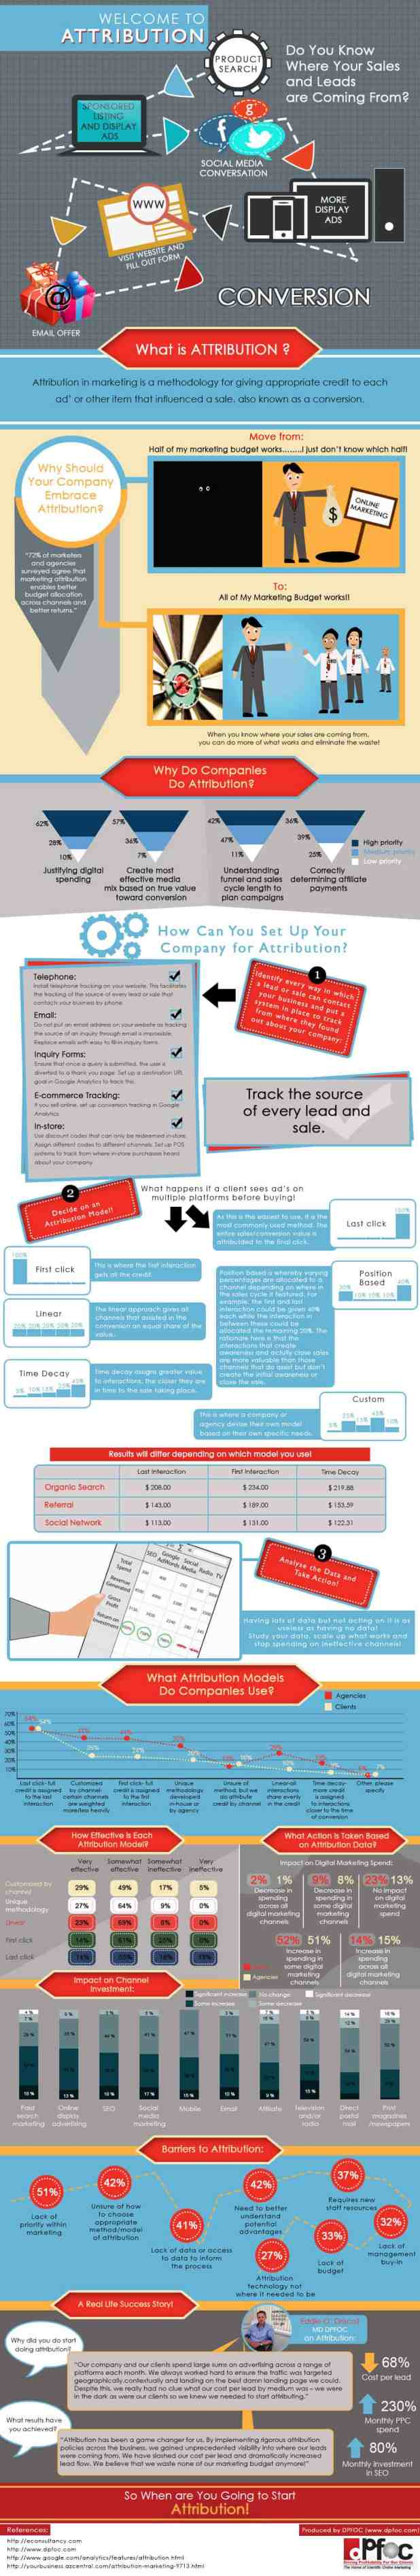 Attribution Infographic